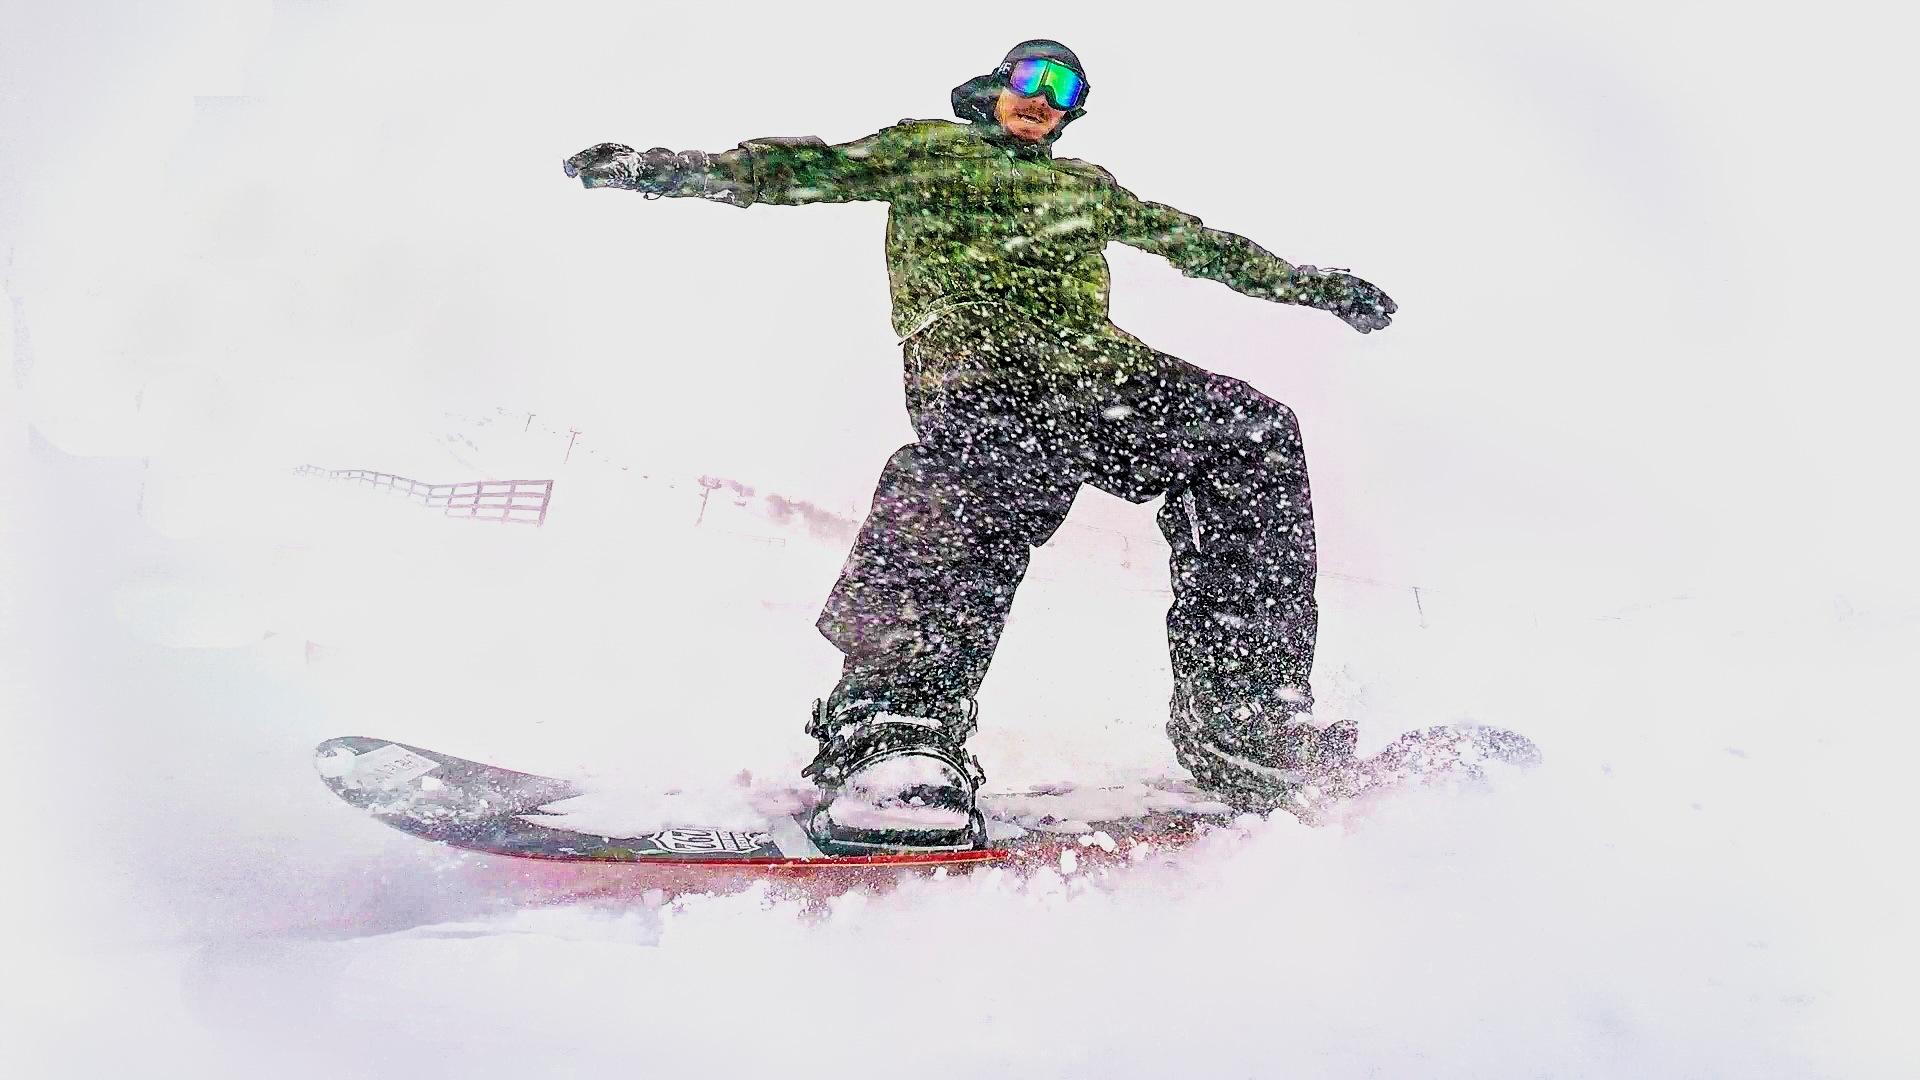 Snowboarding  by Linette Simões